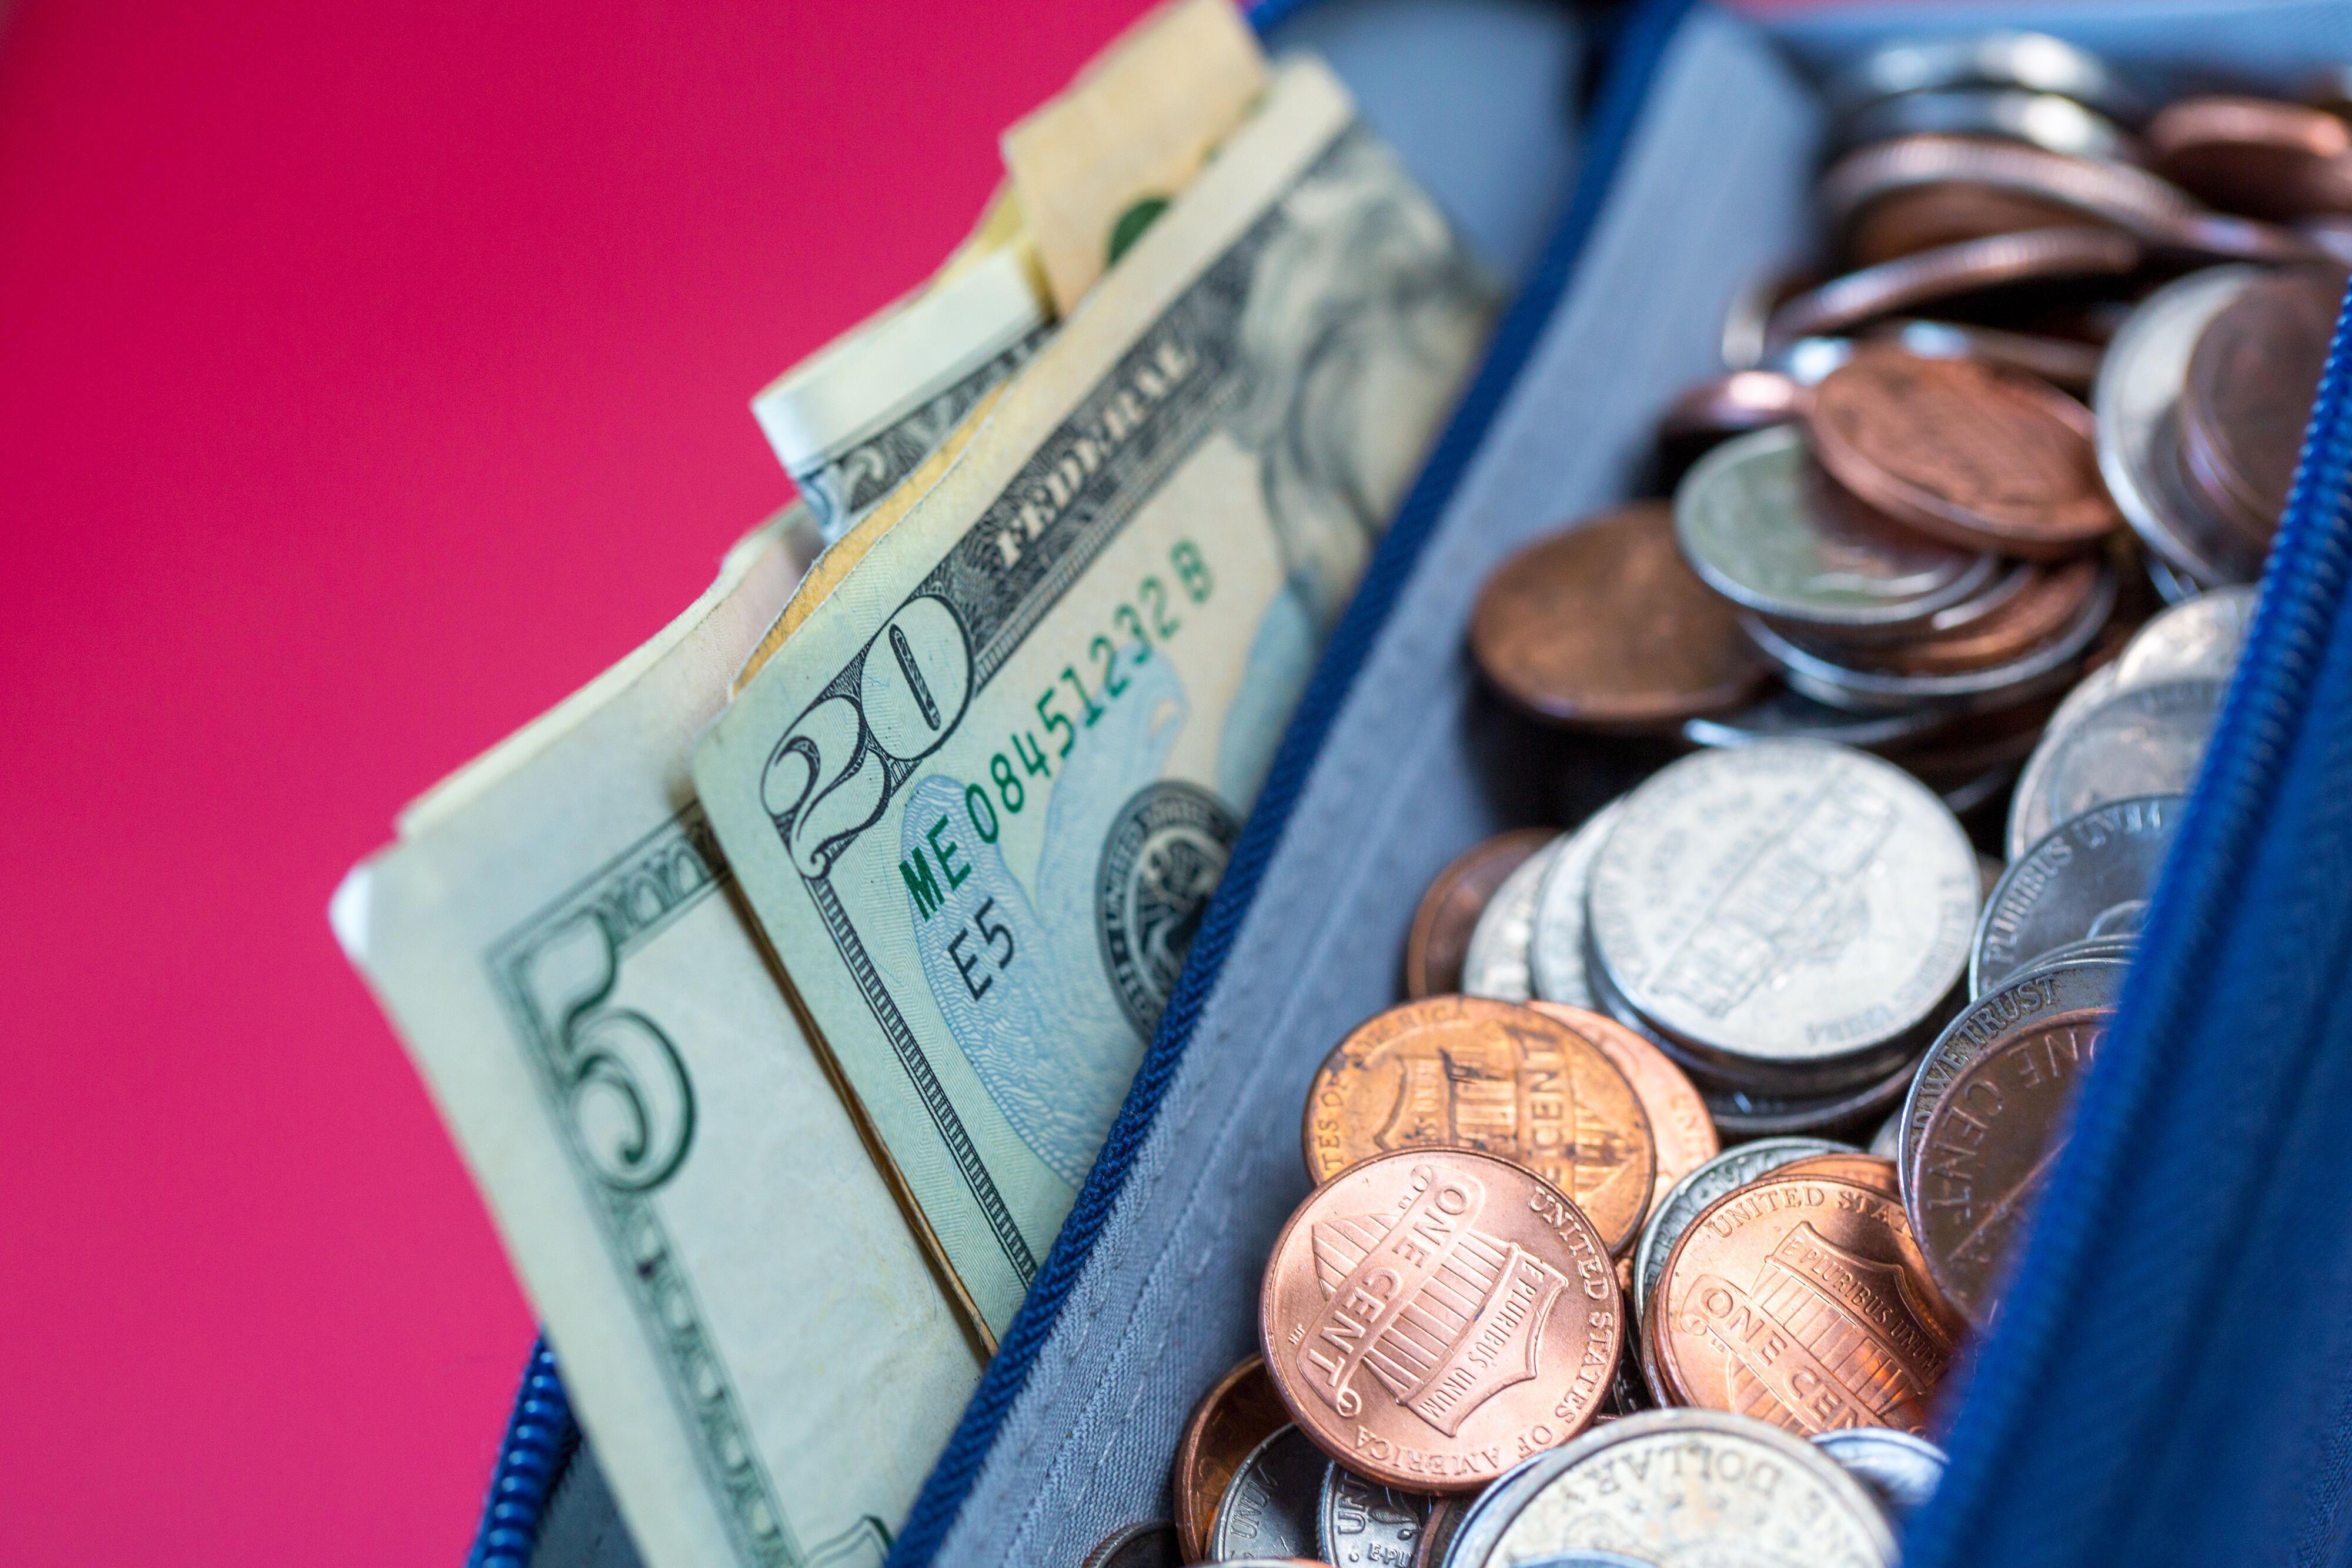 money-bills-coins-wallet-0554